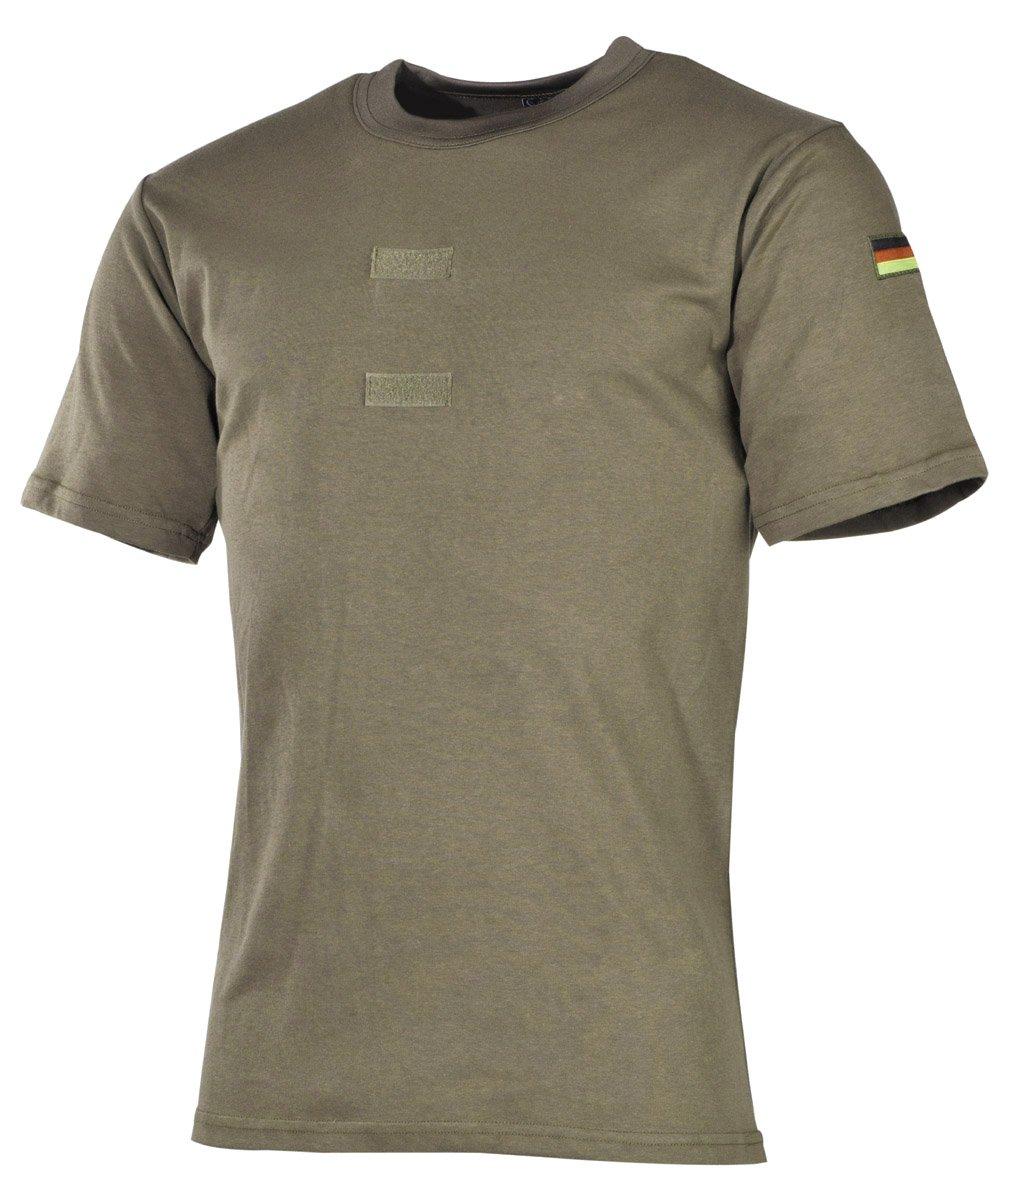 Mil-Tec BW Tropen T-Shirt m.Nat.Abz coyote